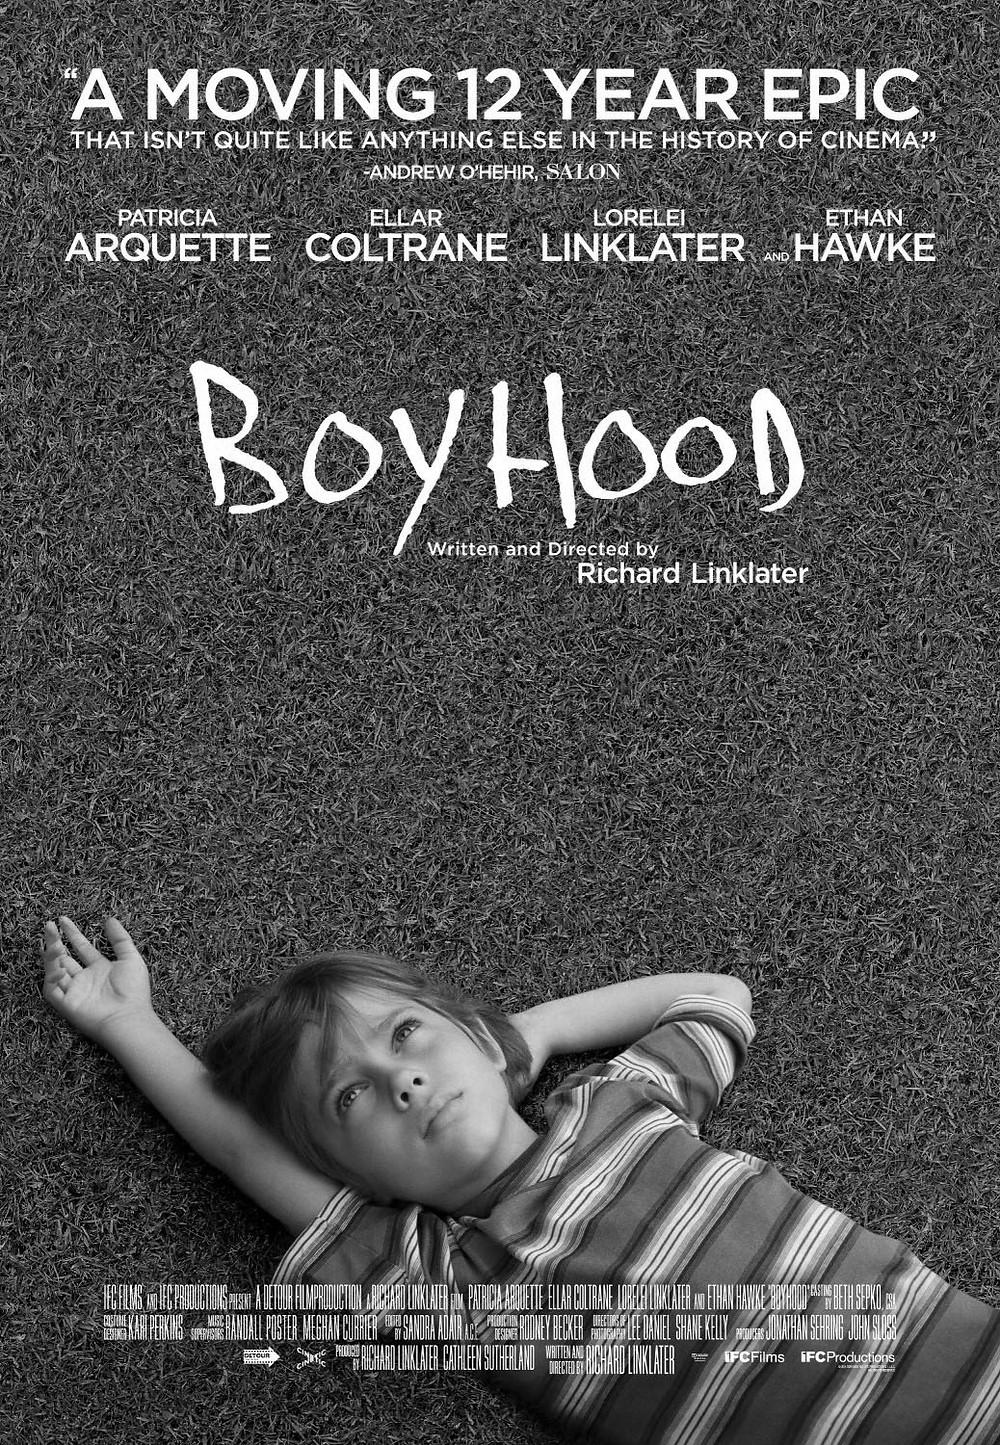 Boyhood Poster.jpg